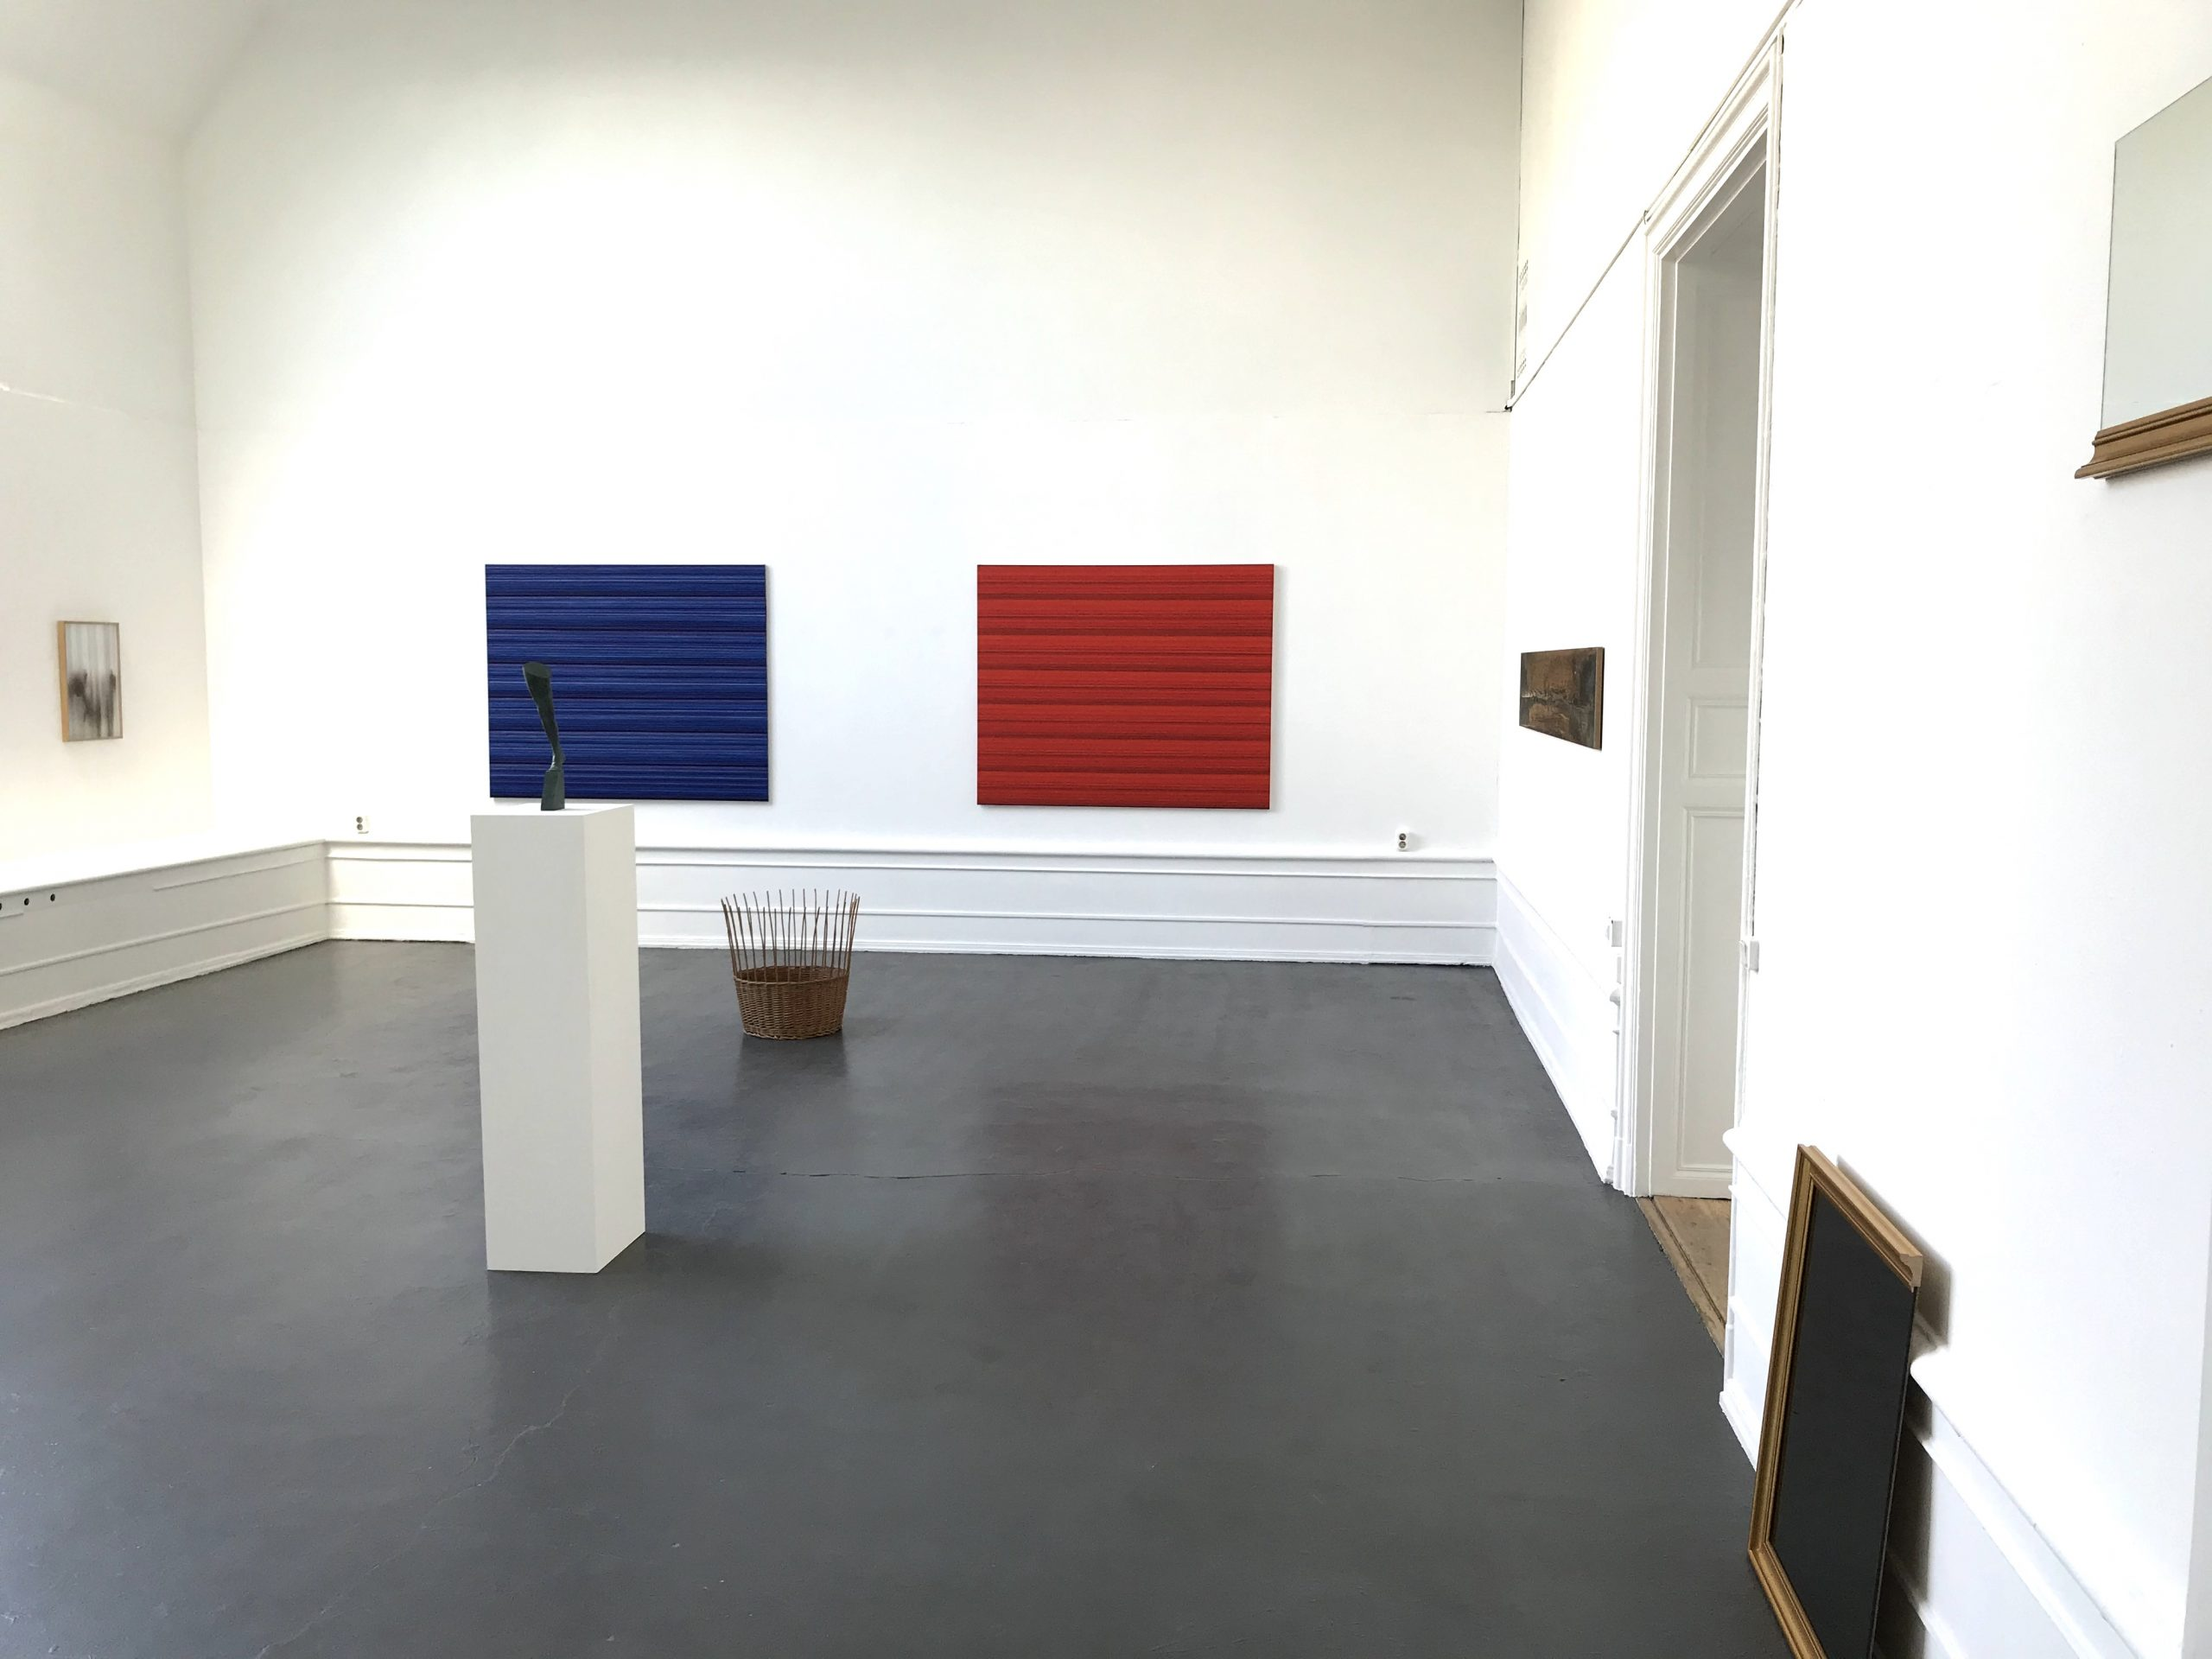 Ande och Materia / Mind and Matter, april 2020. Installation view. Fredrik Wretman, Rickard Sollman